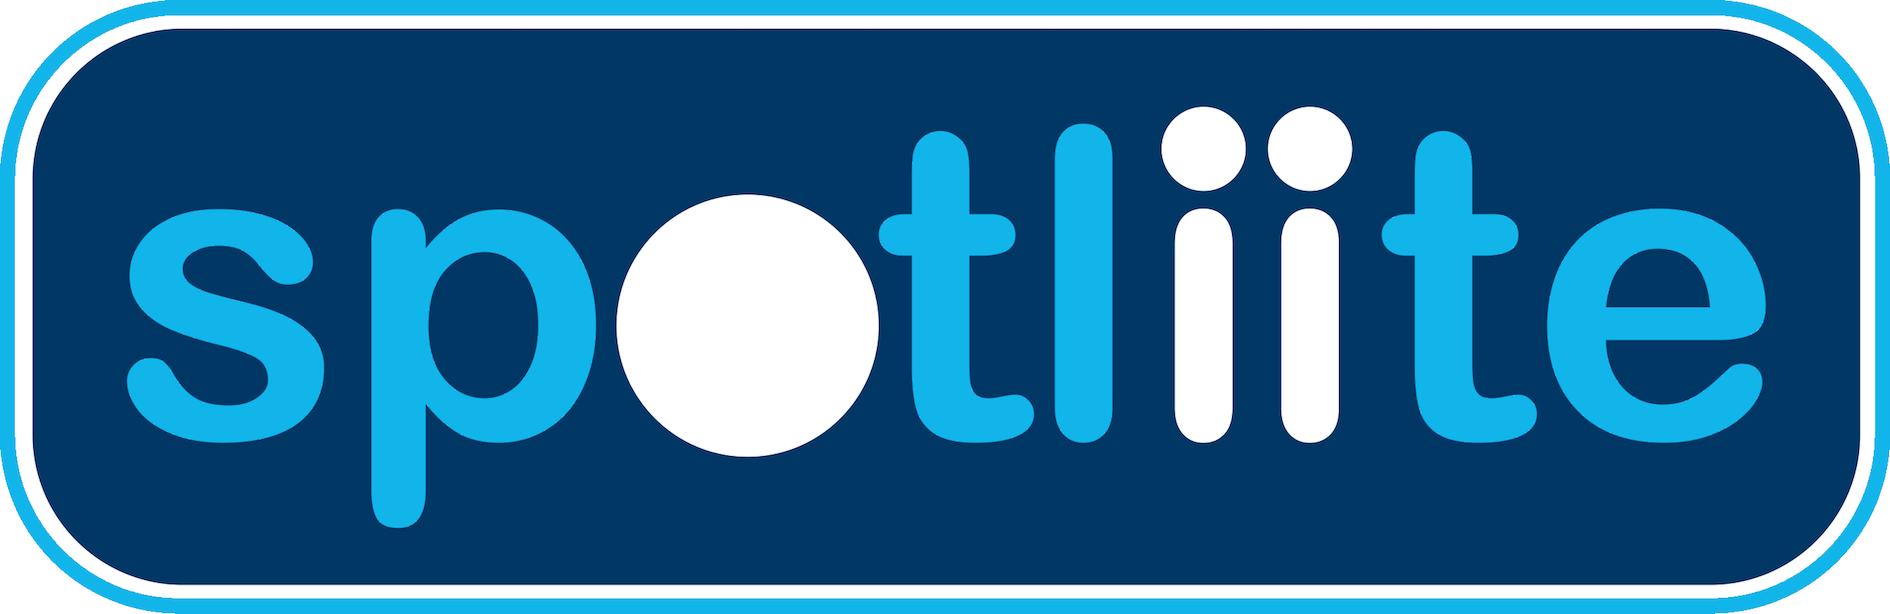 Spotliite Inc.